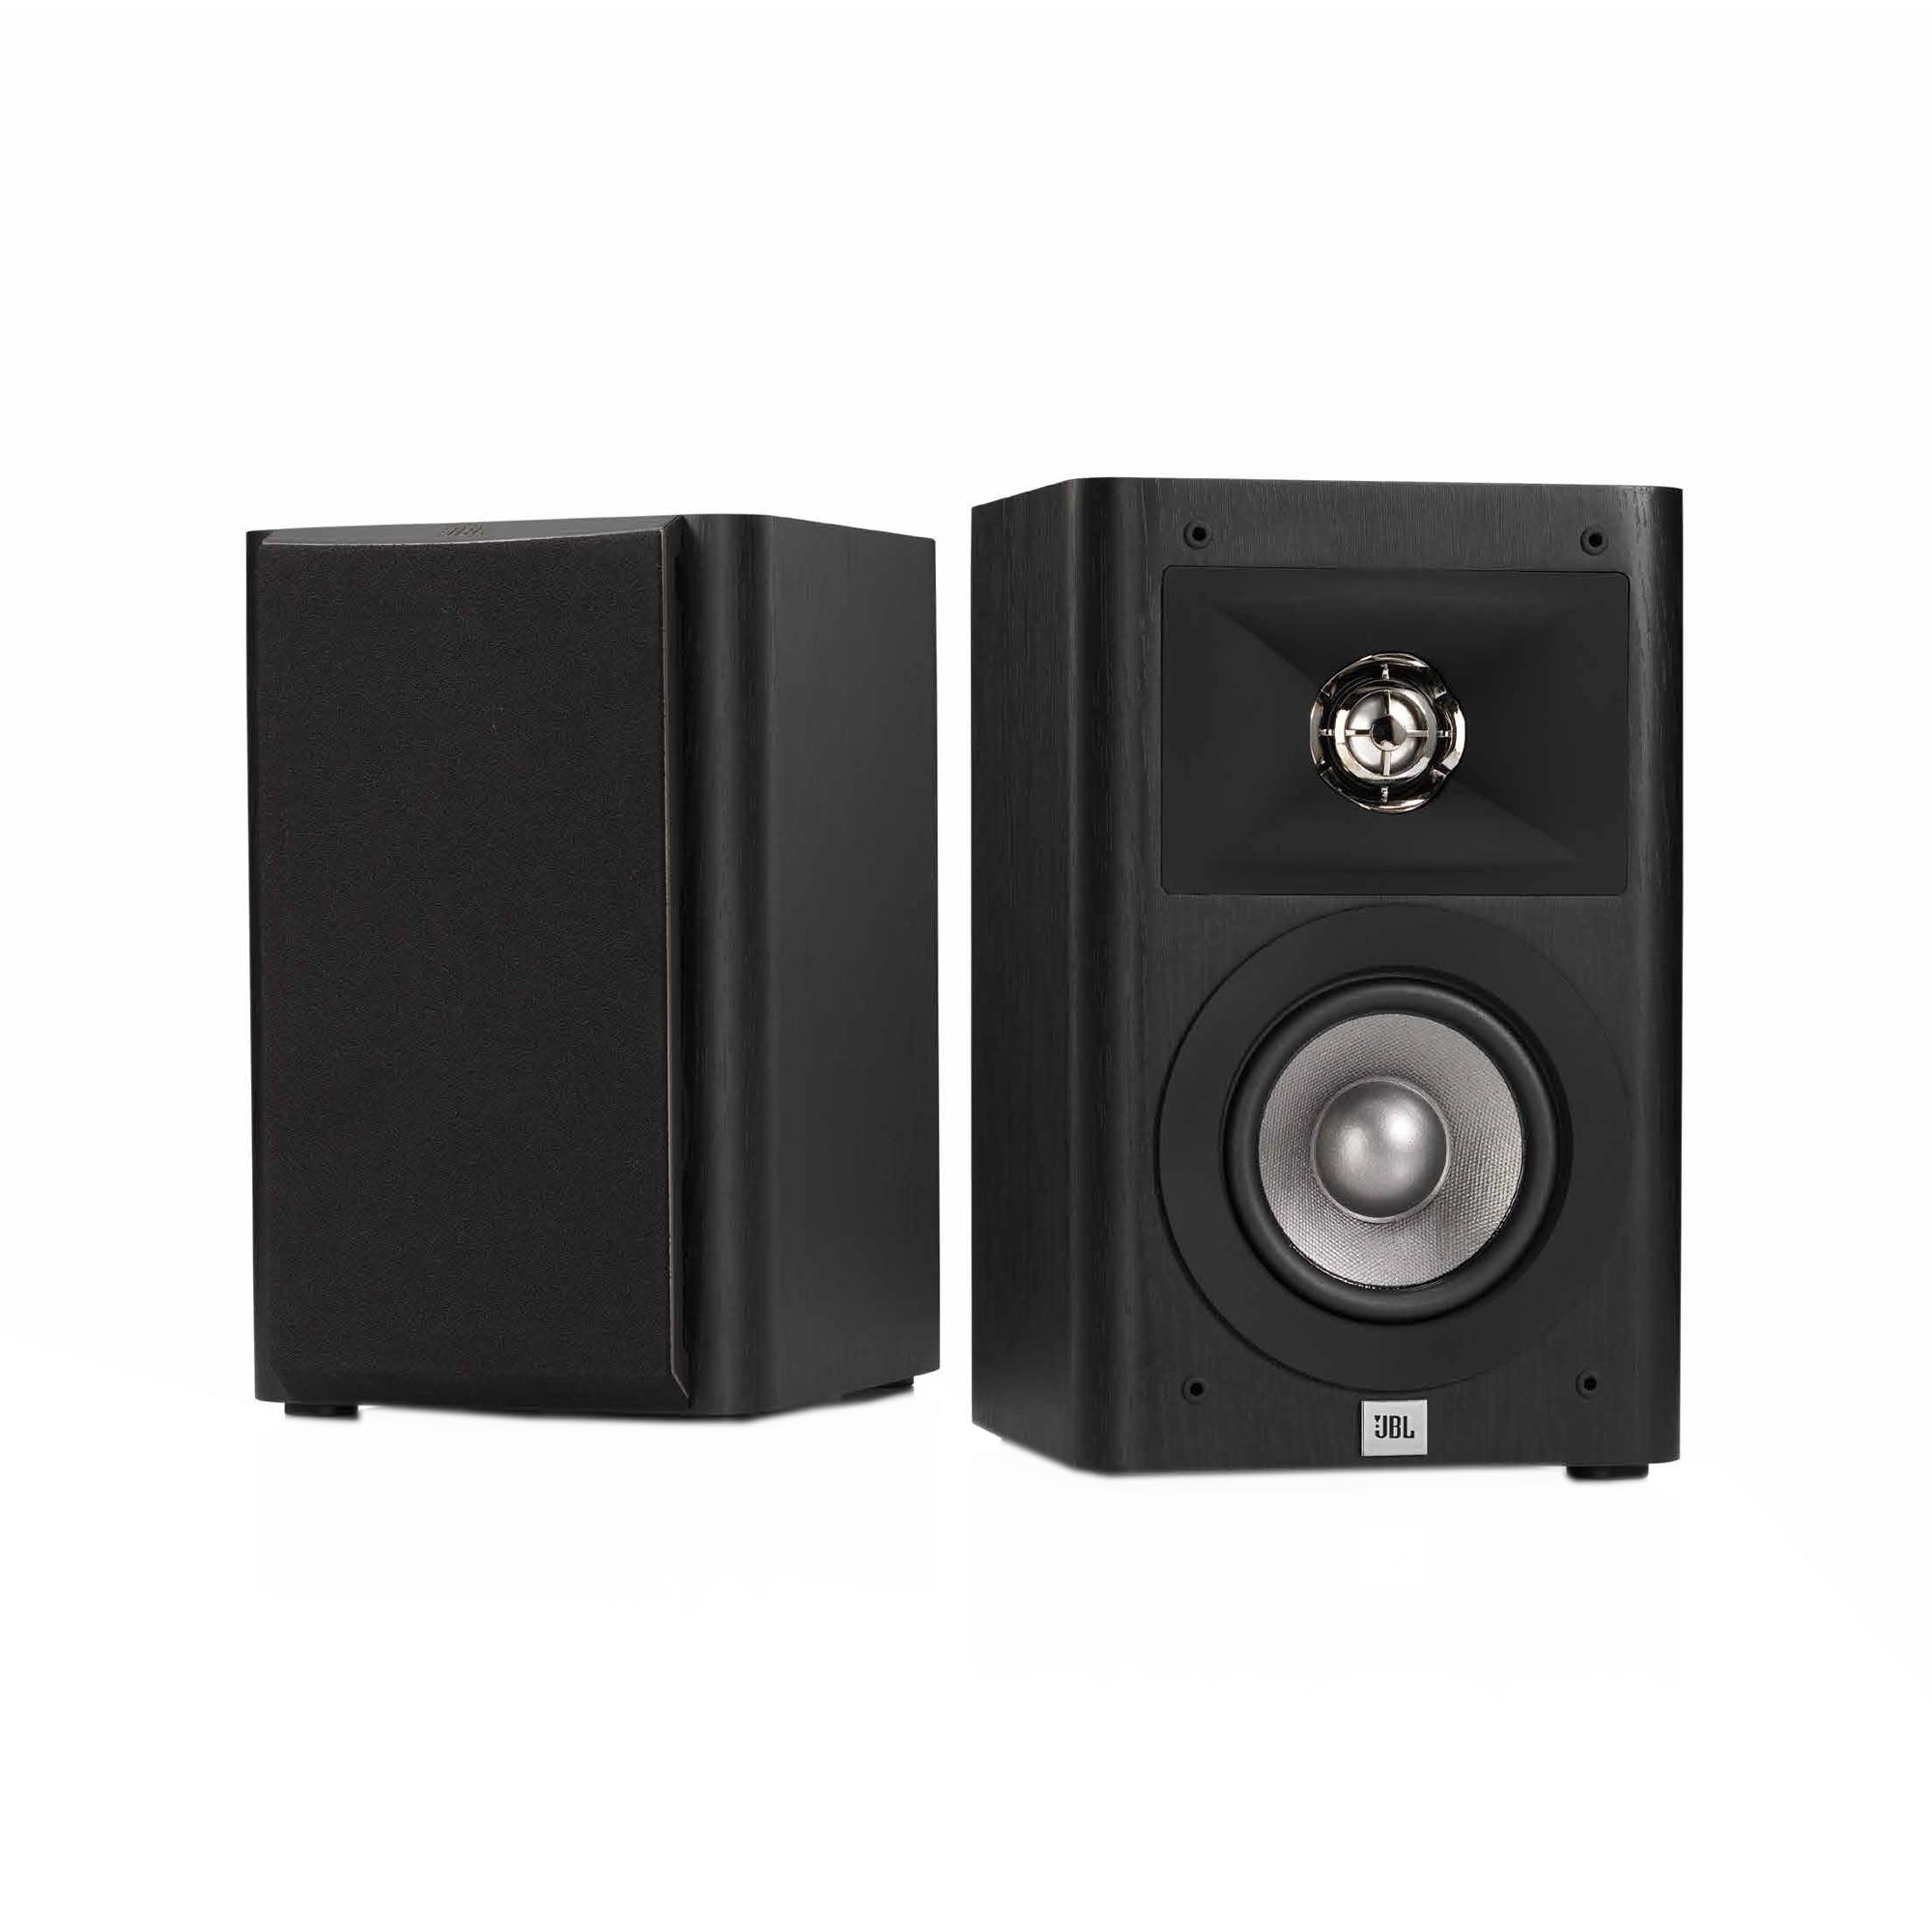 Fotografie Boxe de raft JBL Studio 220, negru